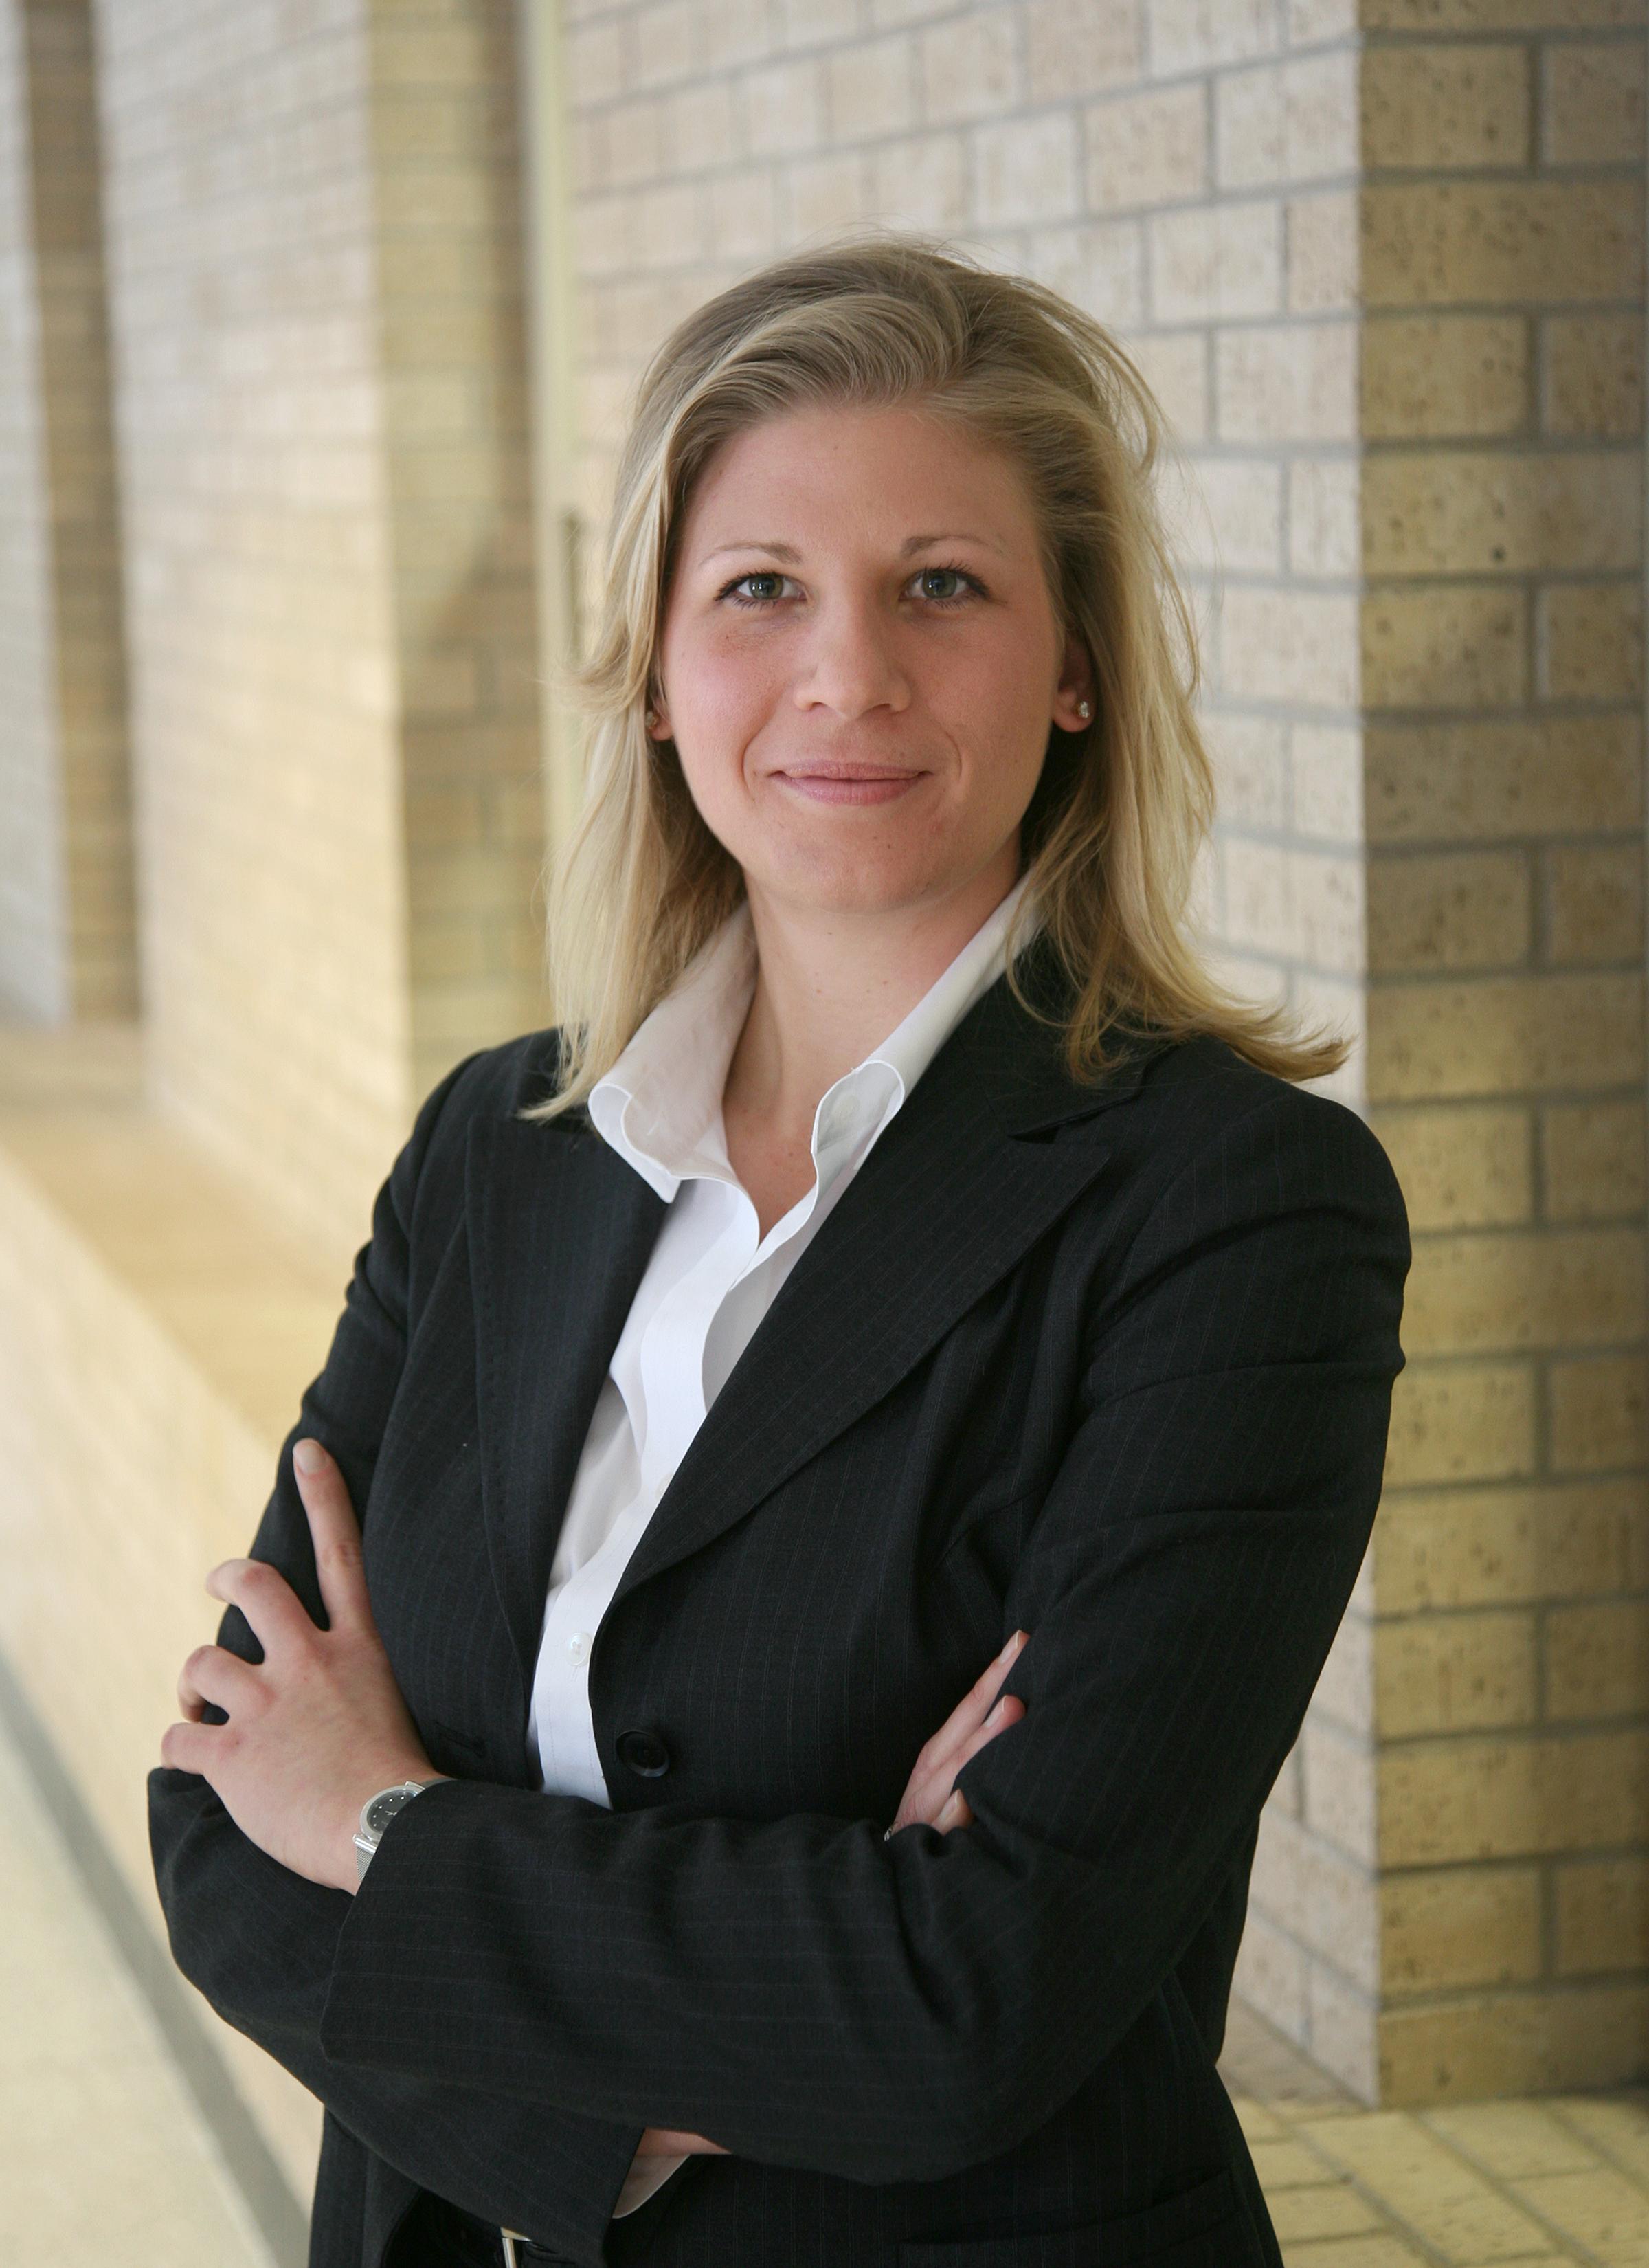 Michele Maiers, DC, MPH, PhD